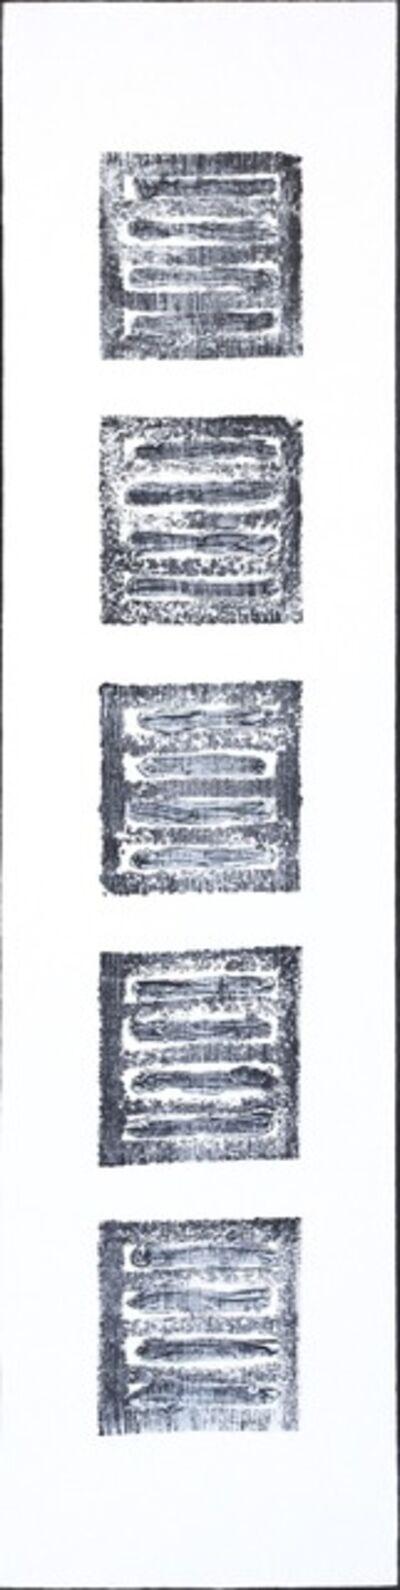 Len Klikunas, 'Black Strata Pattern: Black Butte', 2018